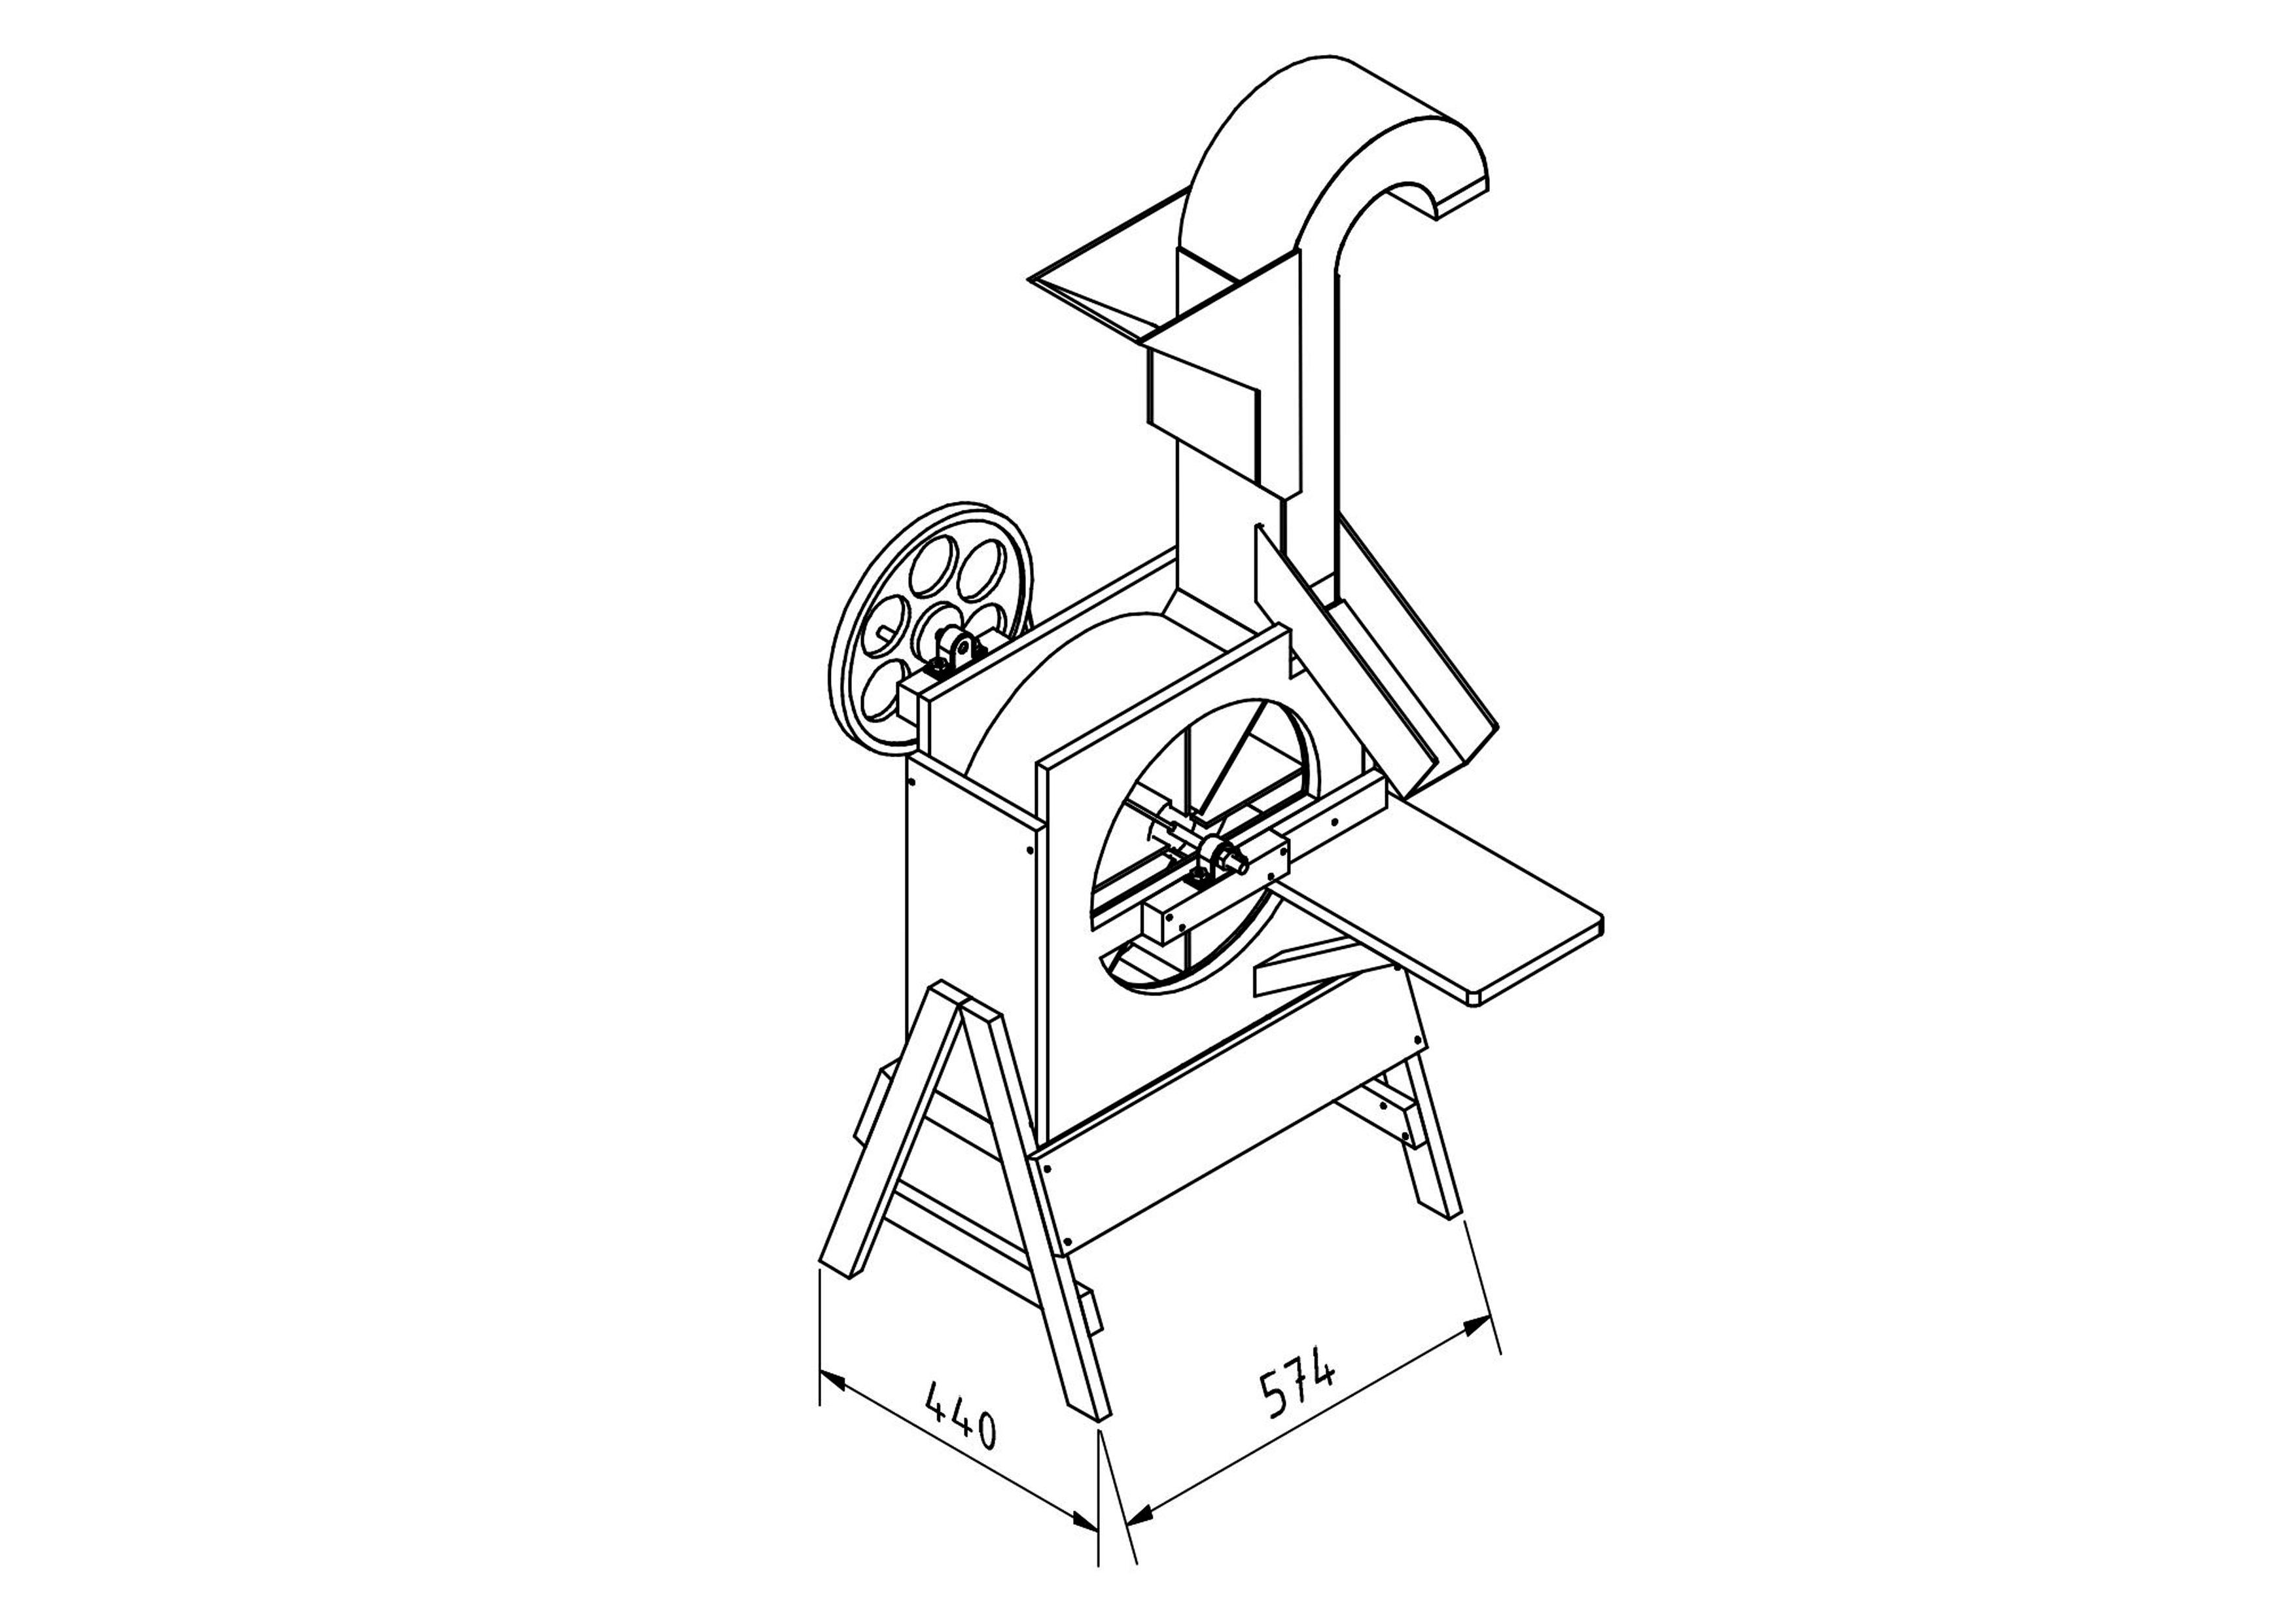 Tpi how hand-operated-winnower 0000.jpg